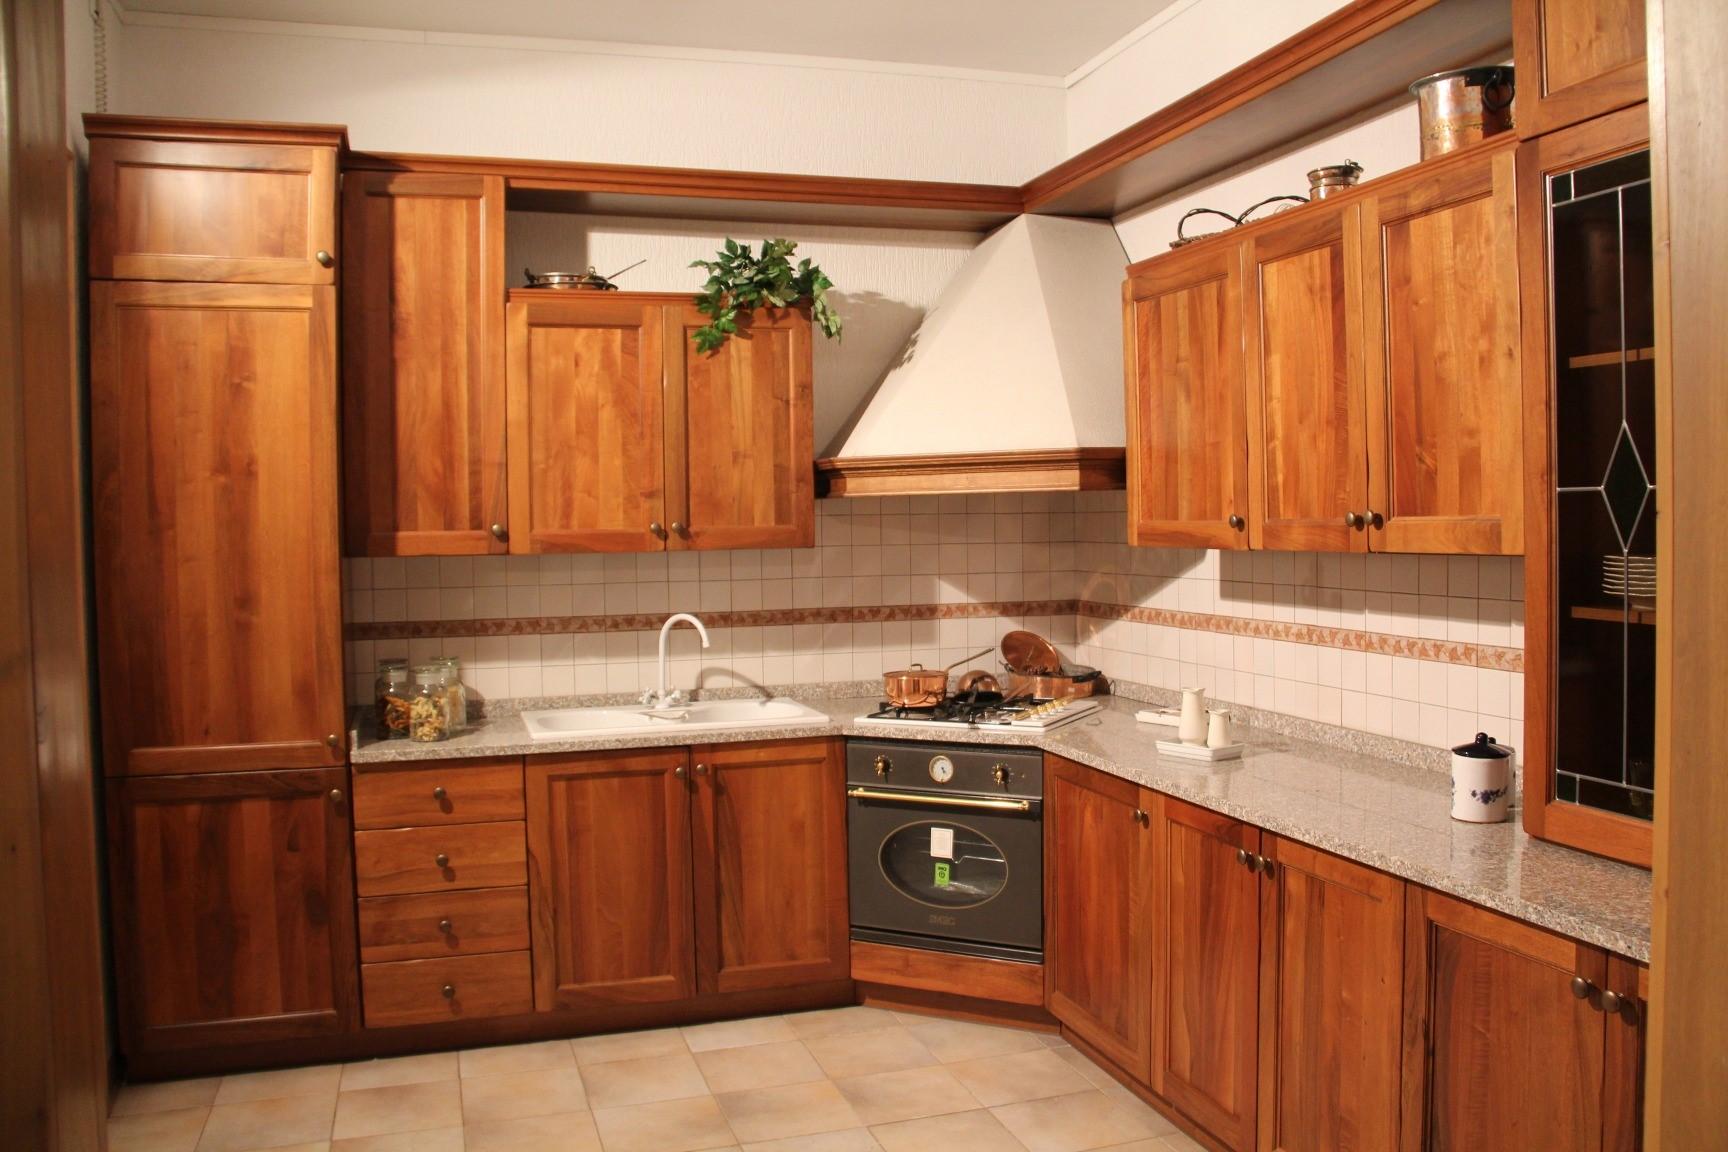 Cucina angolare Concorde noce